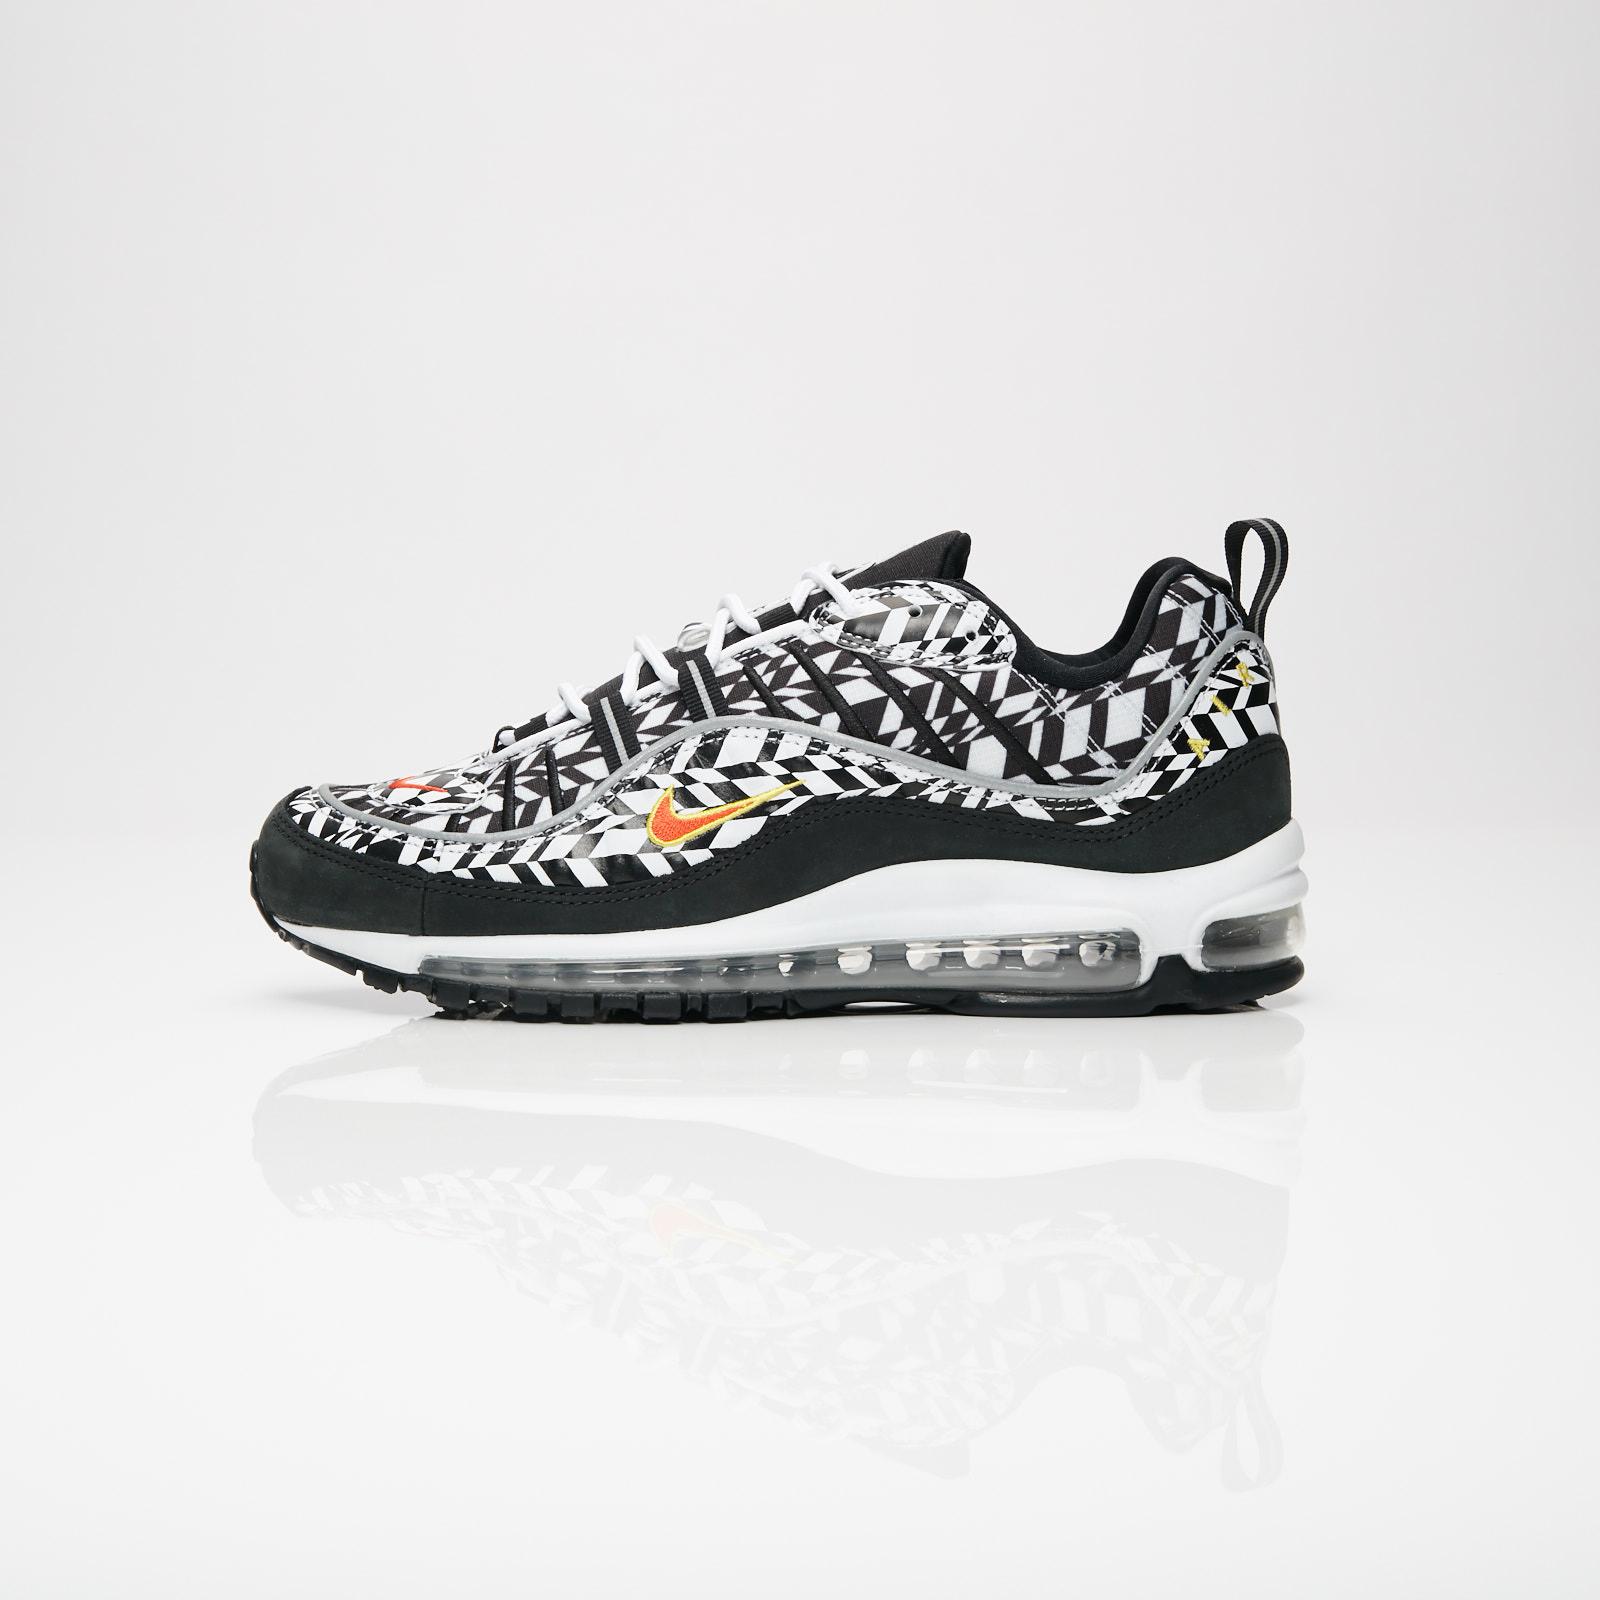 e5915985aade5b Nike Air Max 98 AOP - Aq4130-100 - Sneakersnstuff